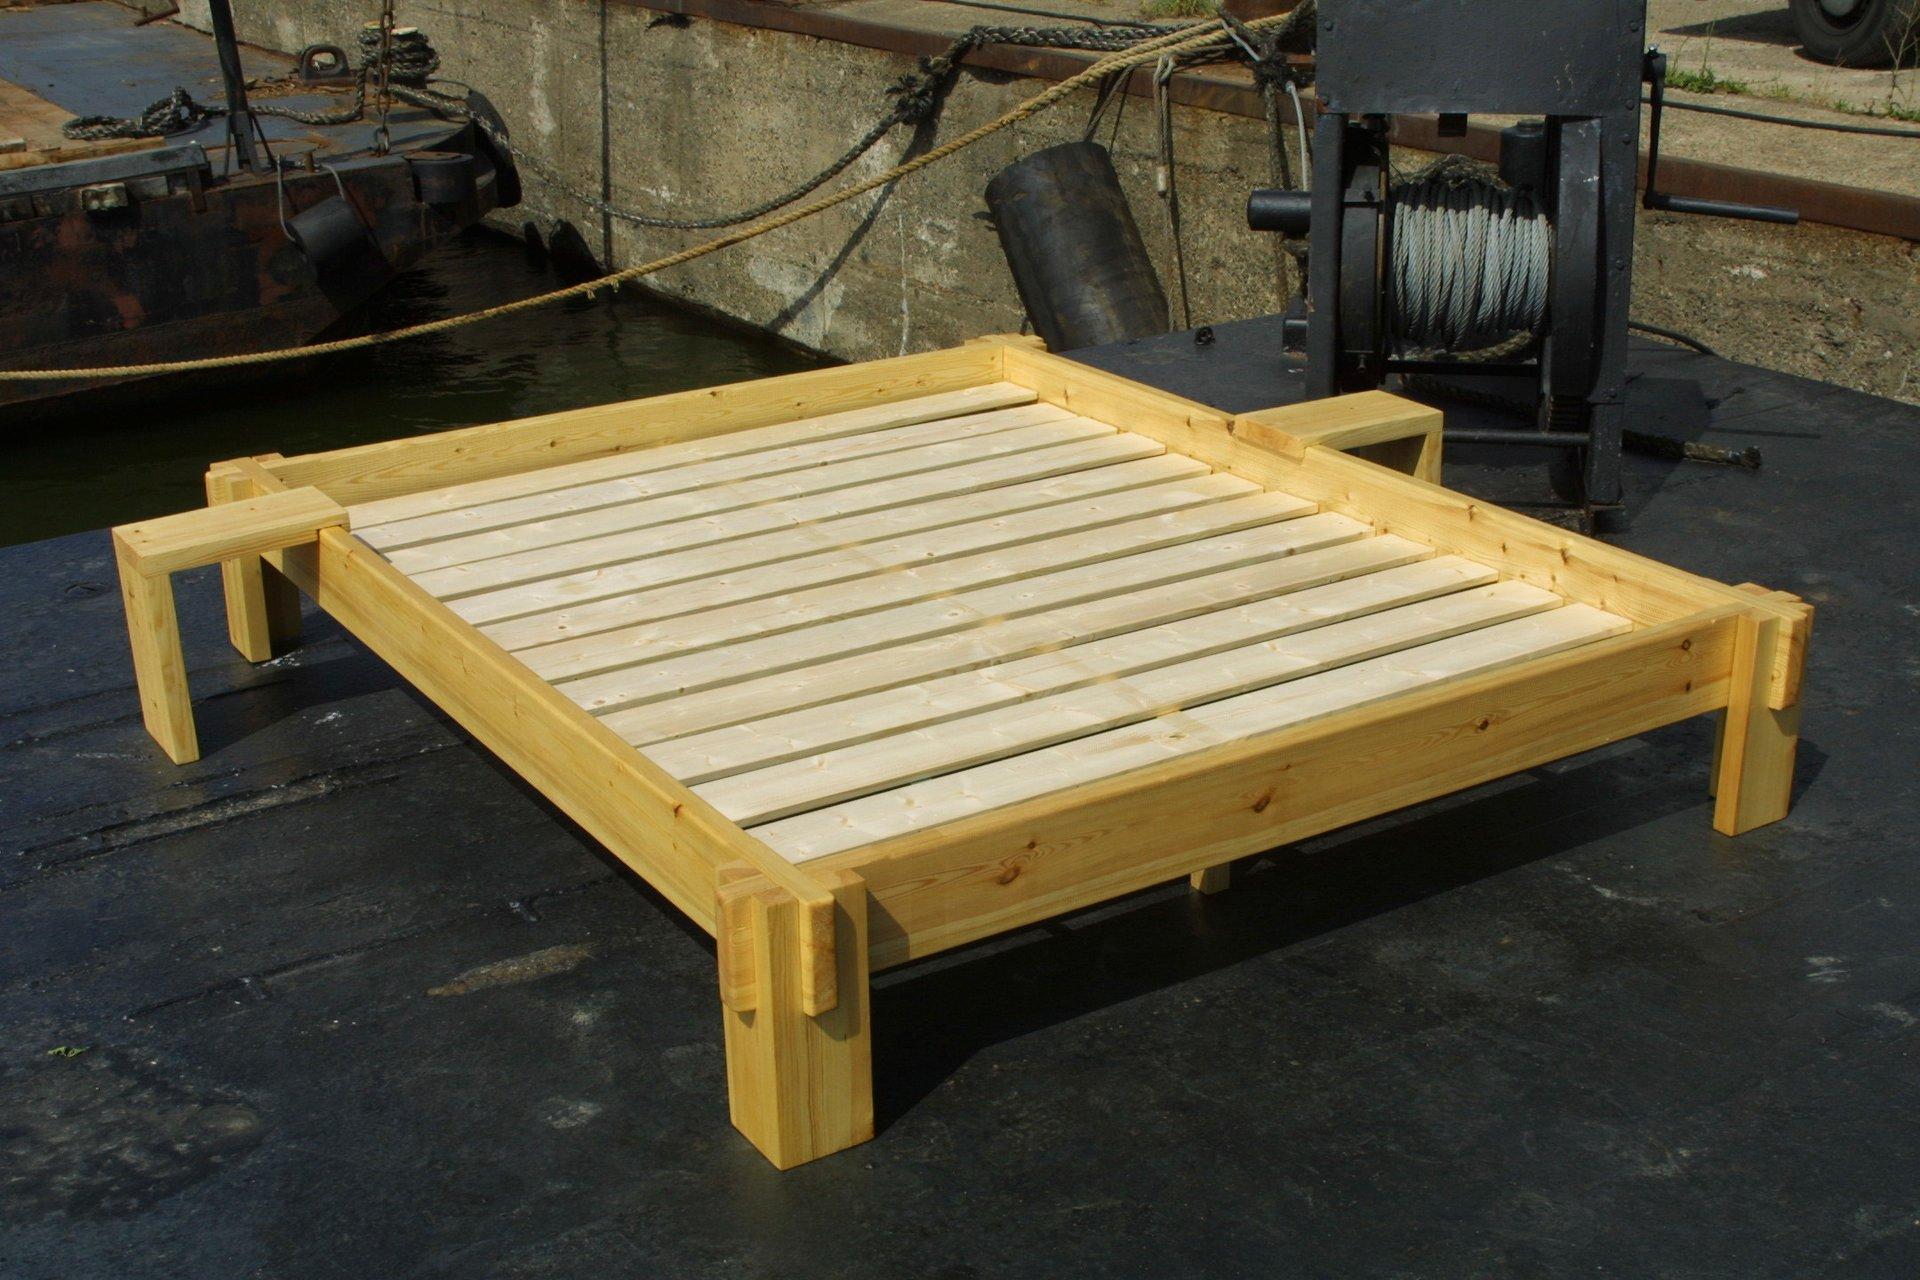 holzbetten g nstig teure m bel aus holz betten g nstig dank preisvergleich betten mit. Black Bedroom Furniture Sets. Home Design Ideas